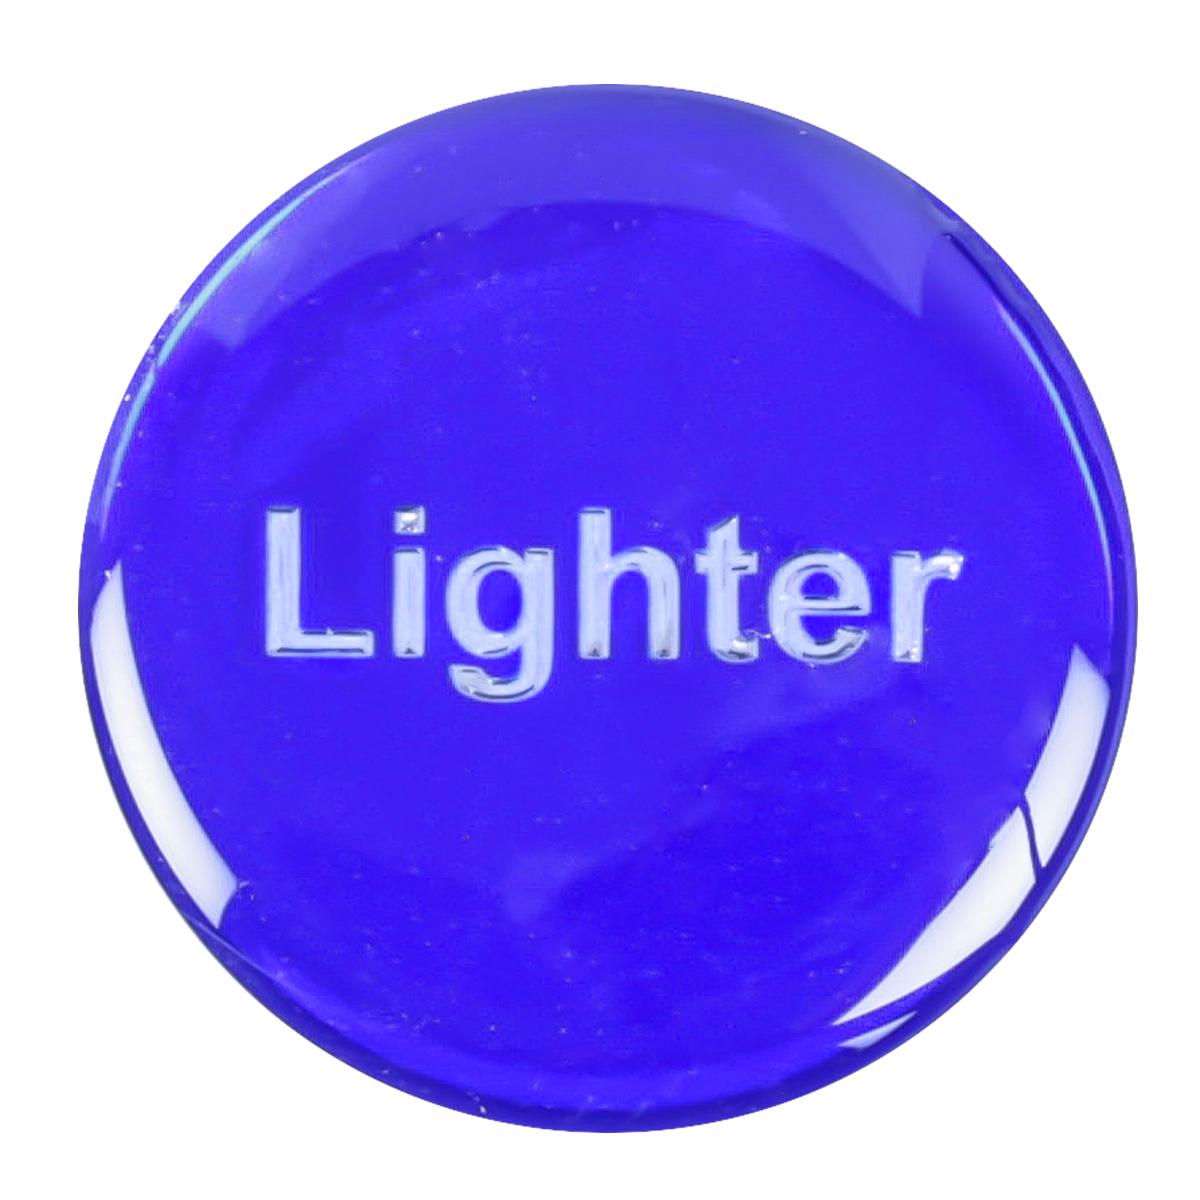 96251 Blue Sticker for Cigarette Lighter Knob